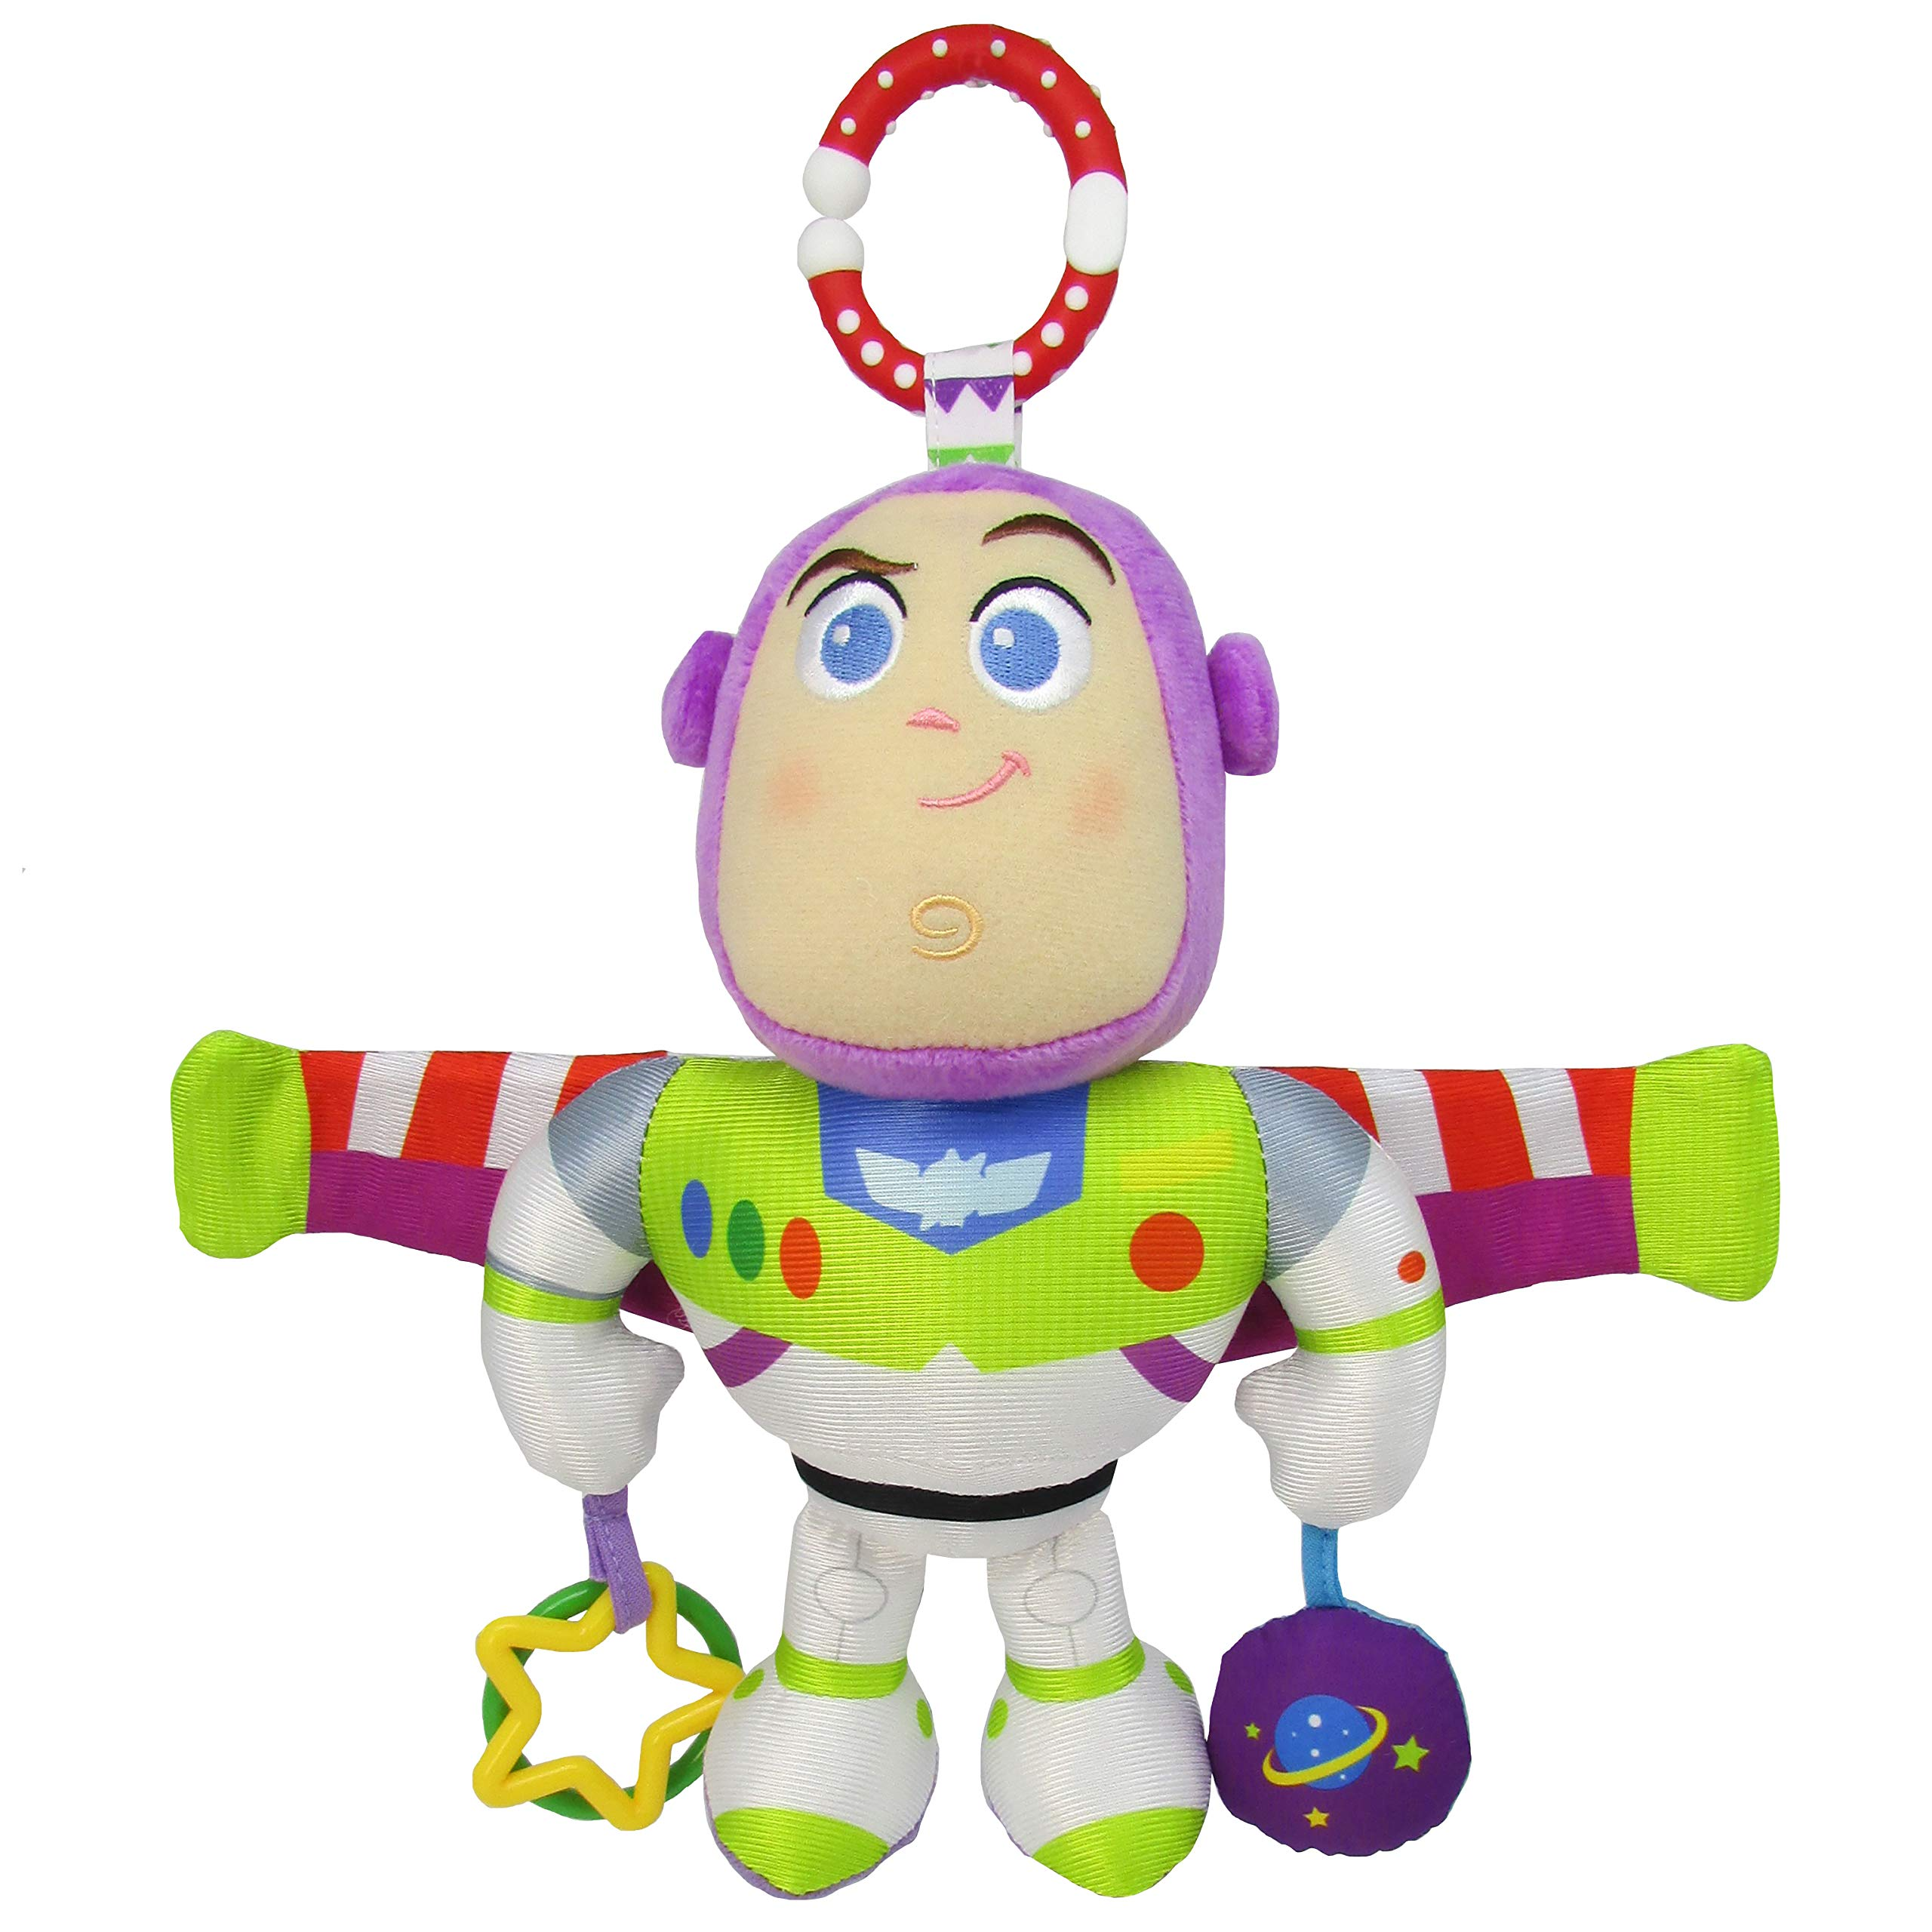 Disney•Pixar Toy Story Buzz Lightyear On The Go Activity Toy